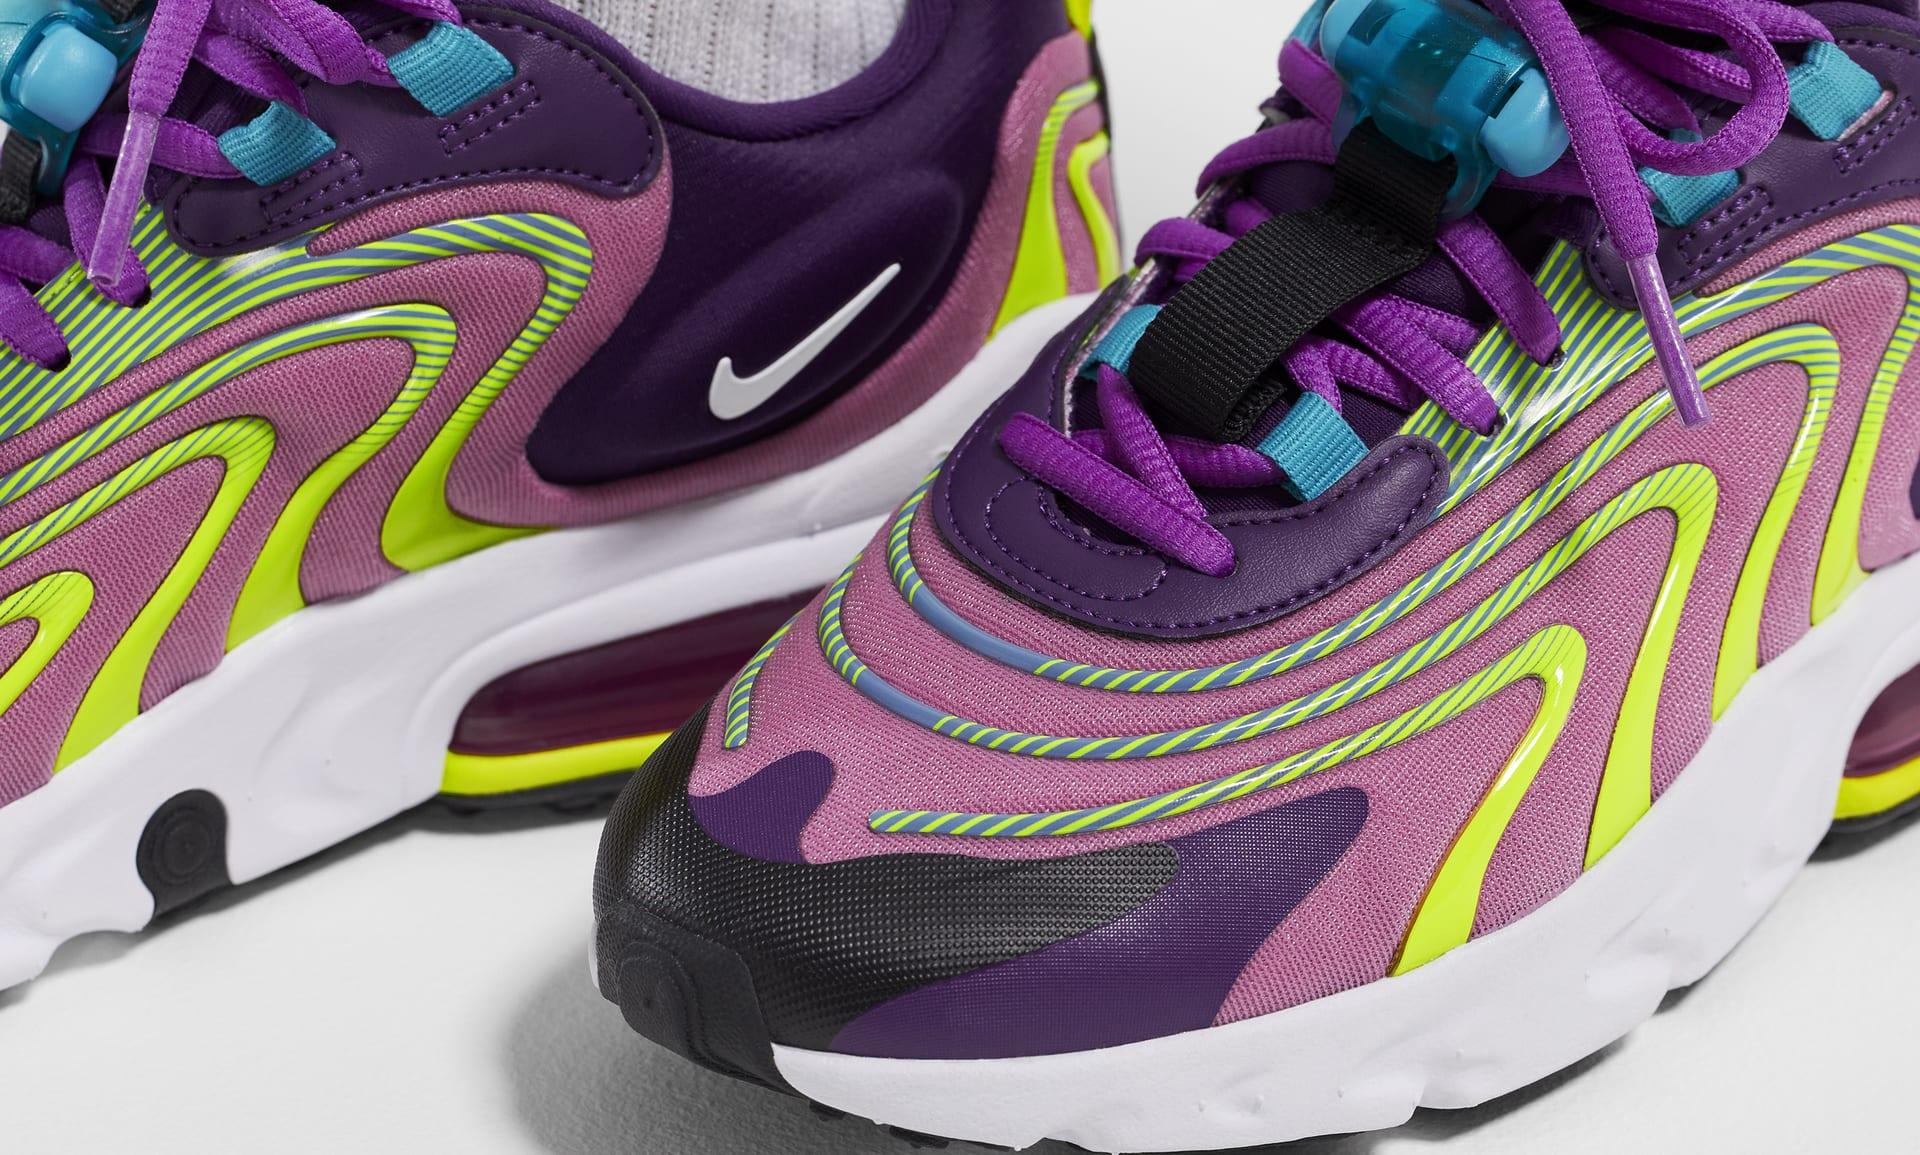 Nike Air Max 270 React ENG Pink CK2595 001  